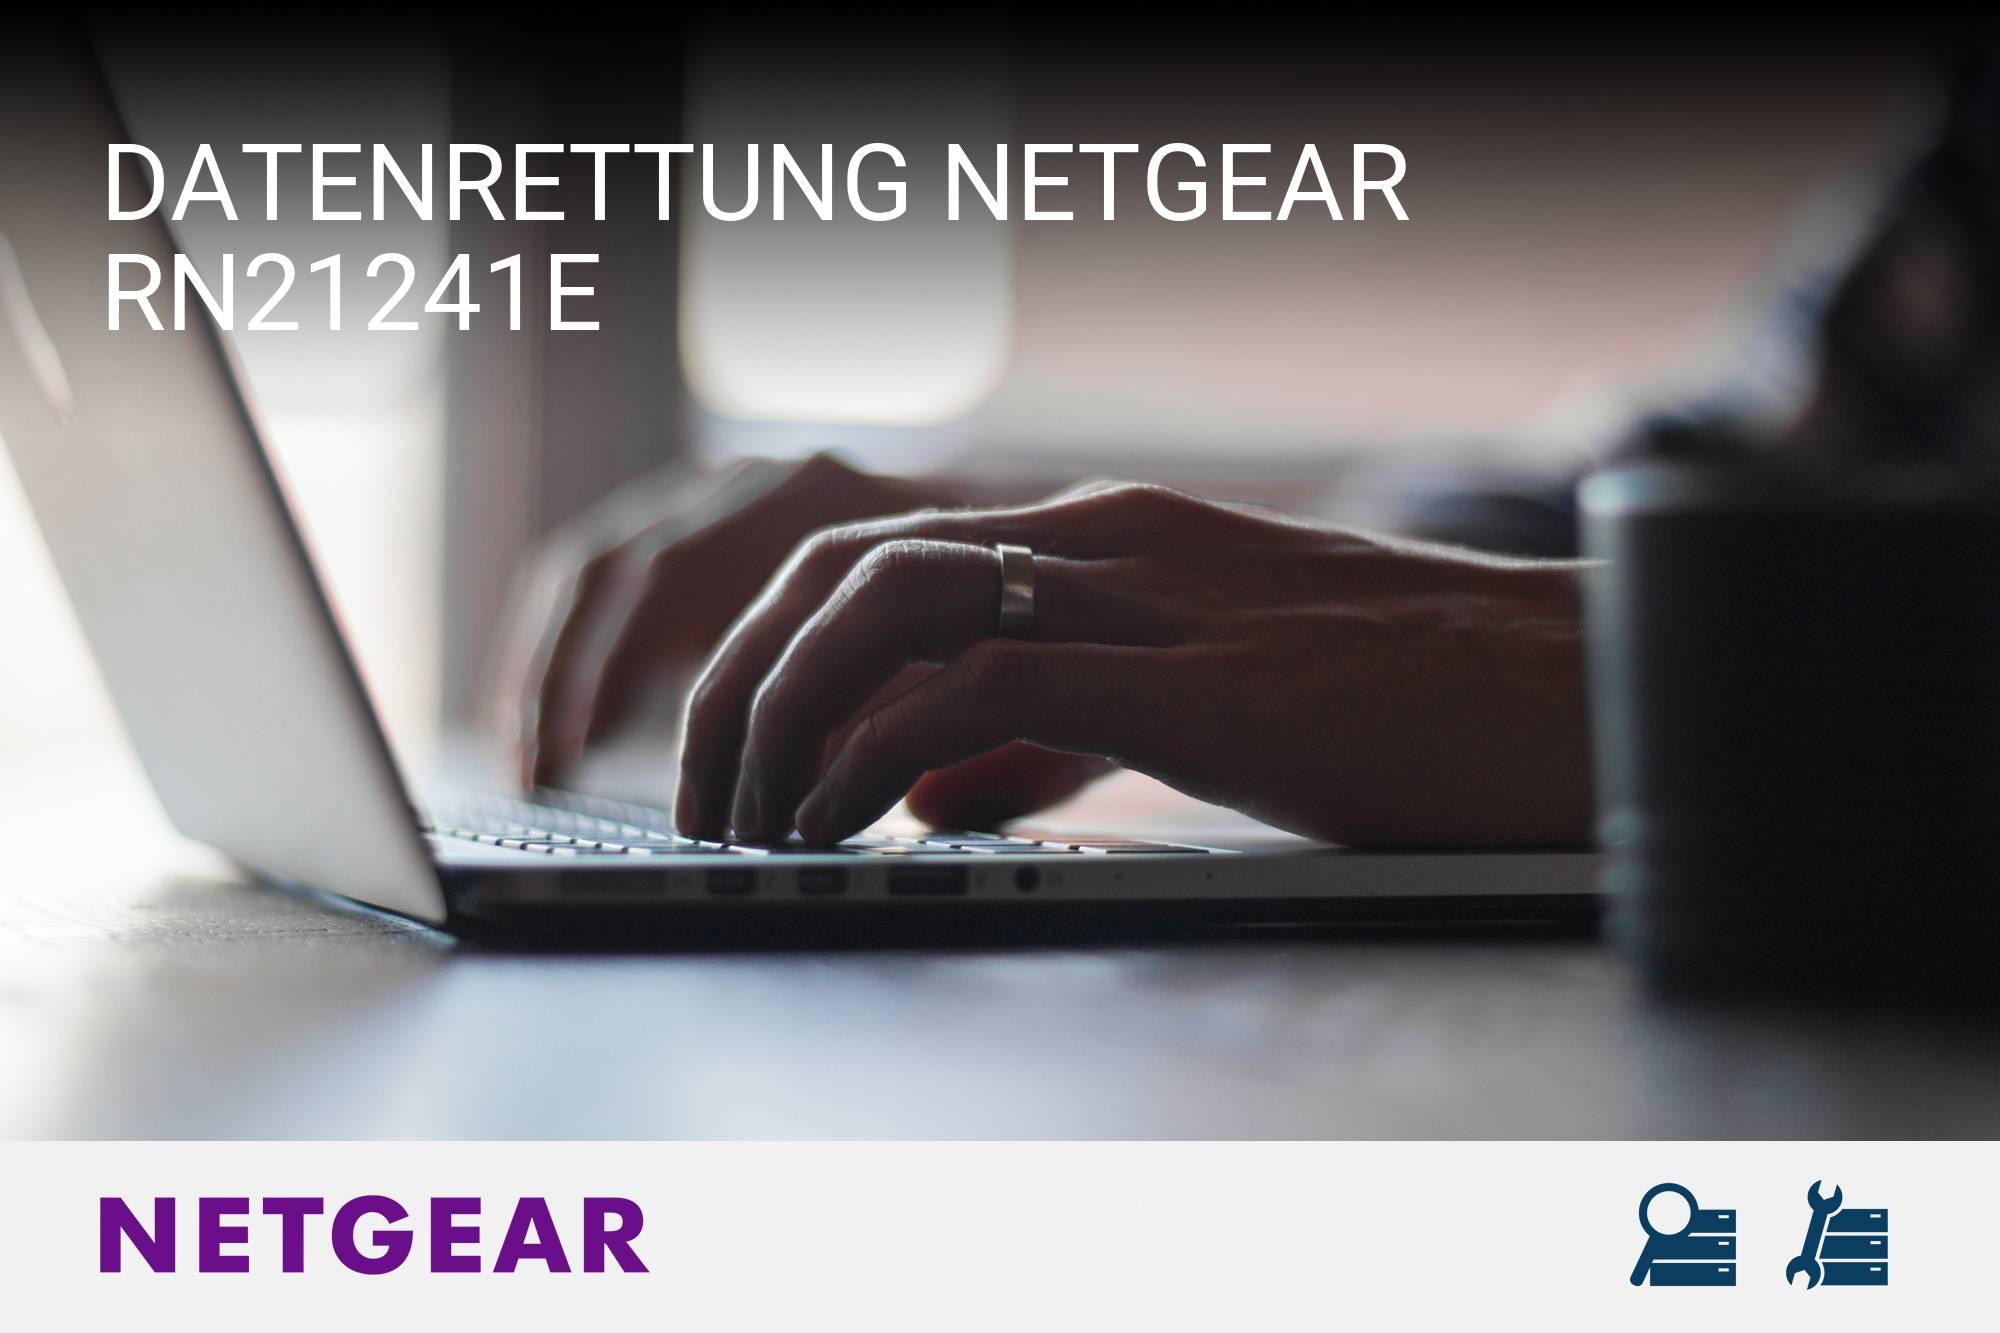 Netgear RN21241E